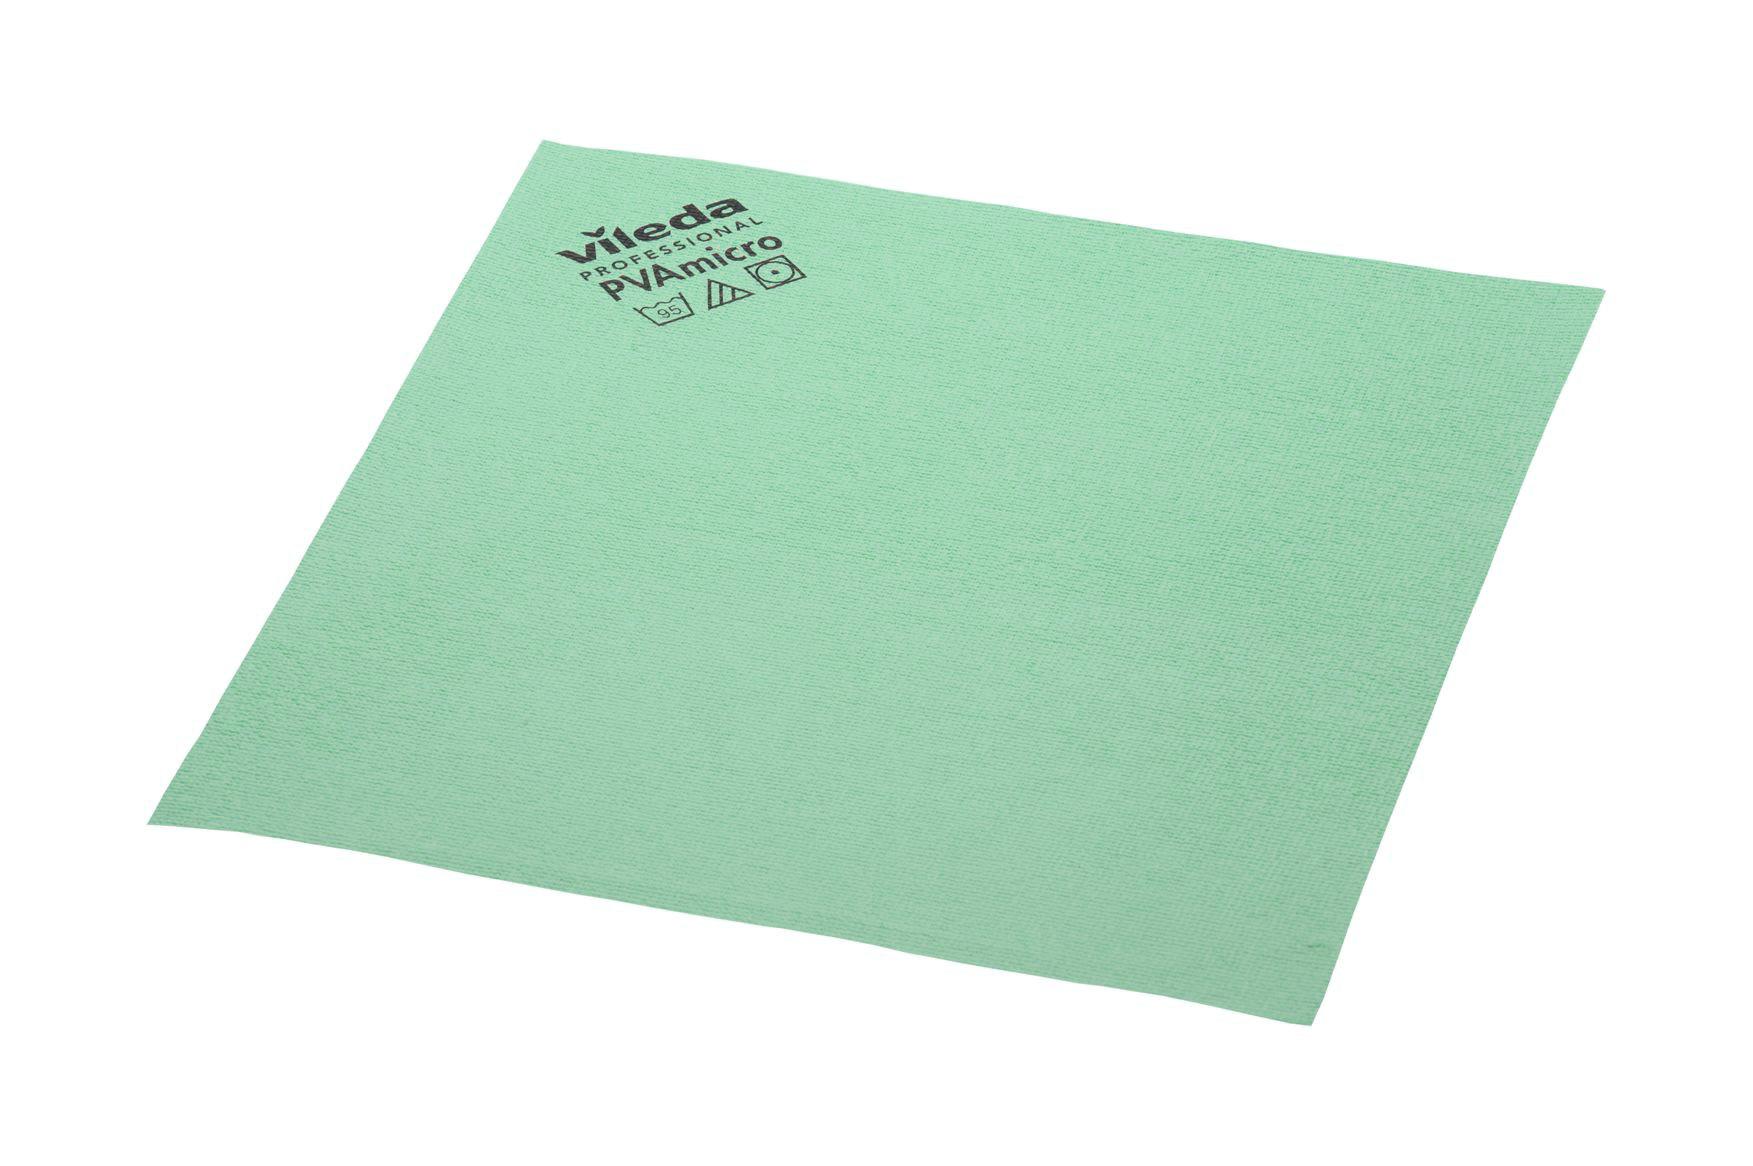 Vileda PVA Micro, 5 Stück/Packung, grün, 38 x 35 cm